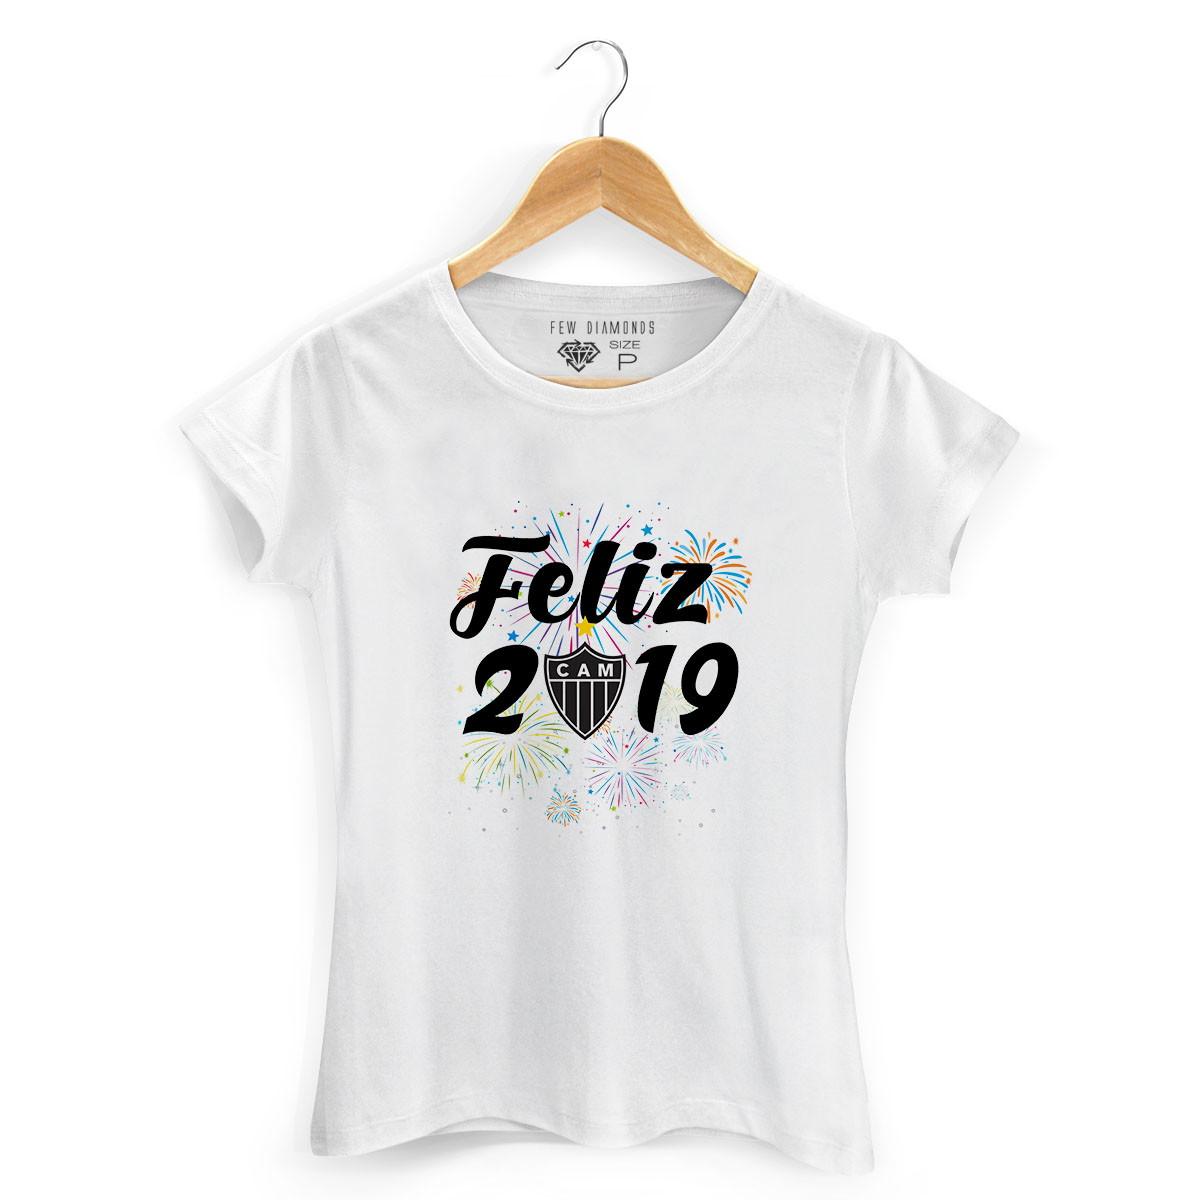 6277a4795e Camisa Atletico 2019